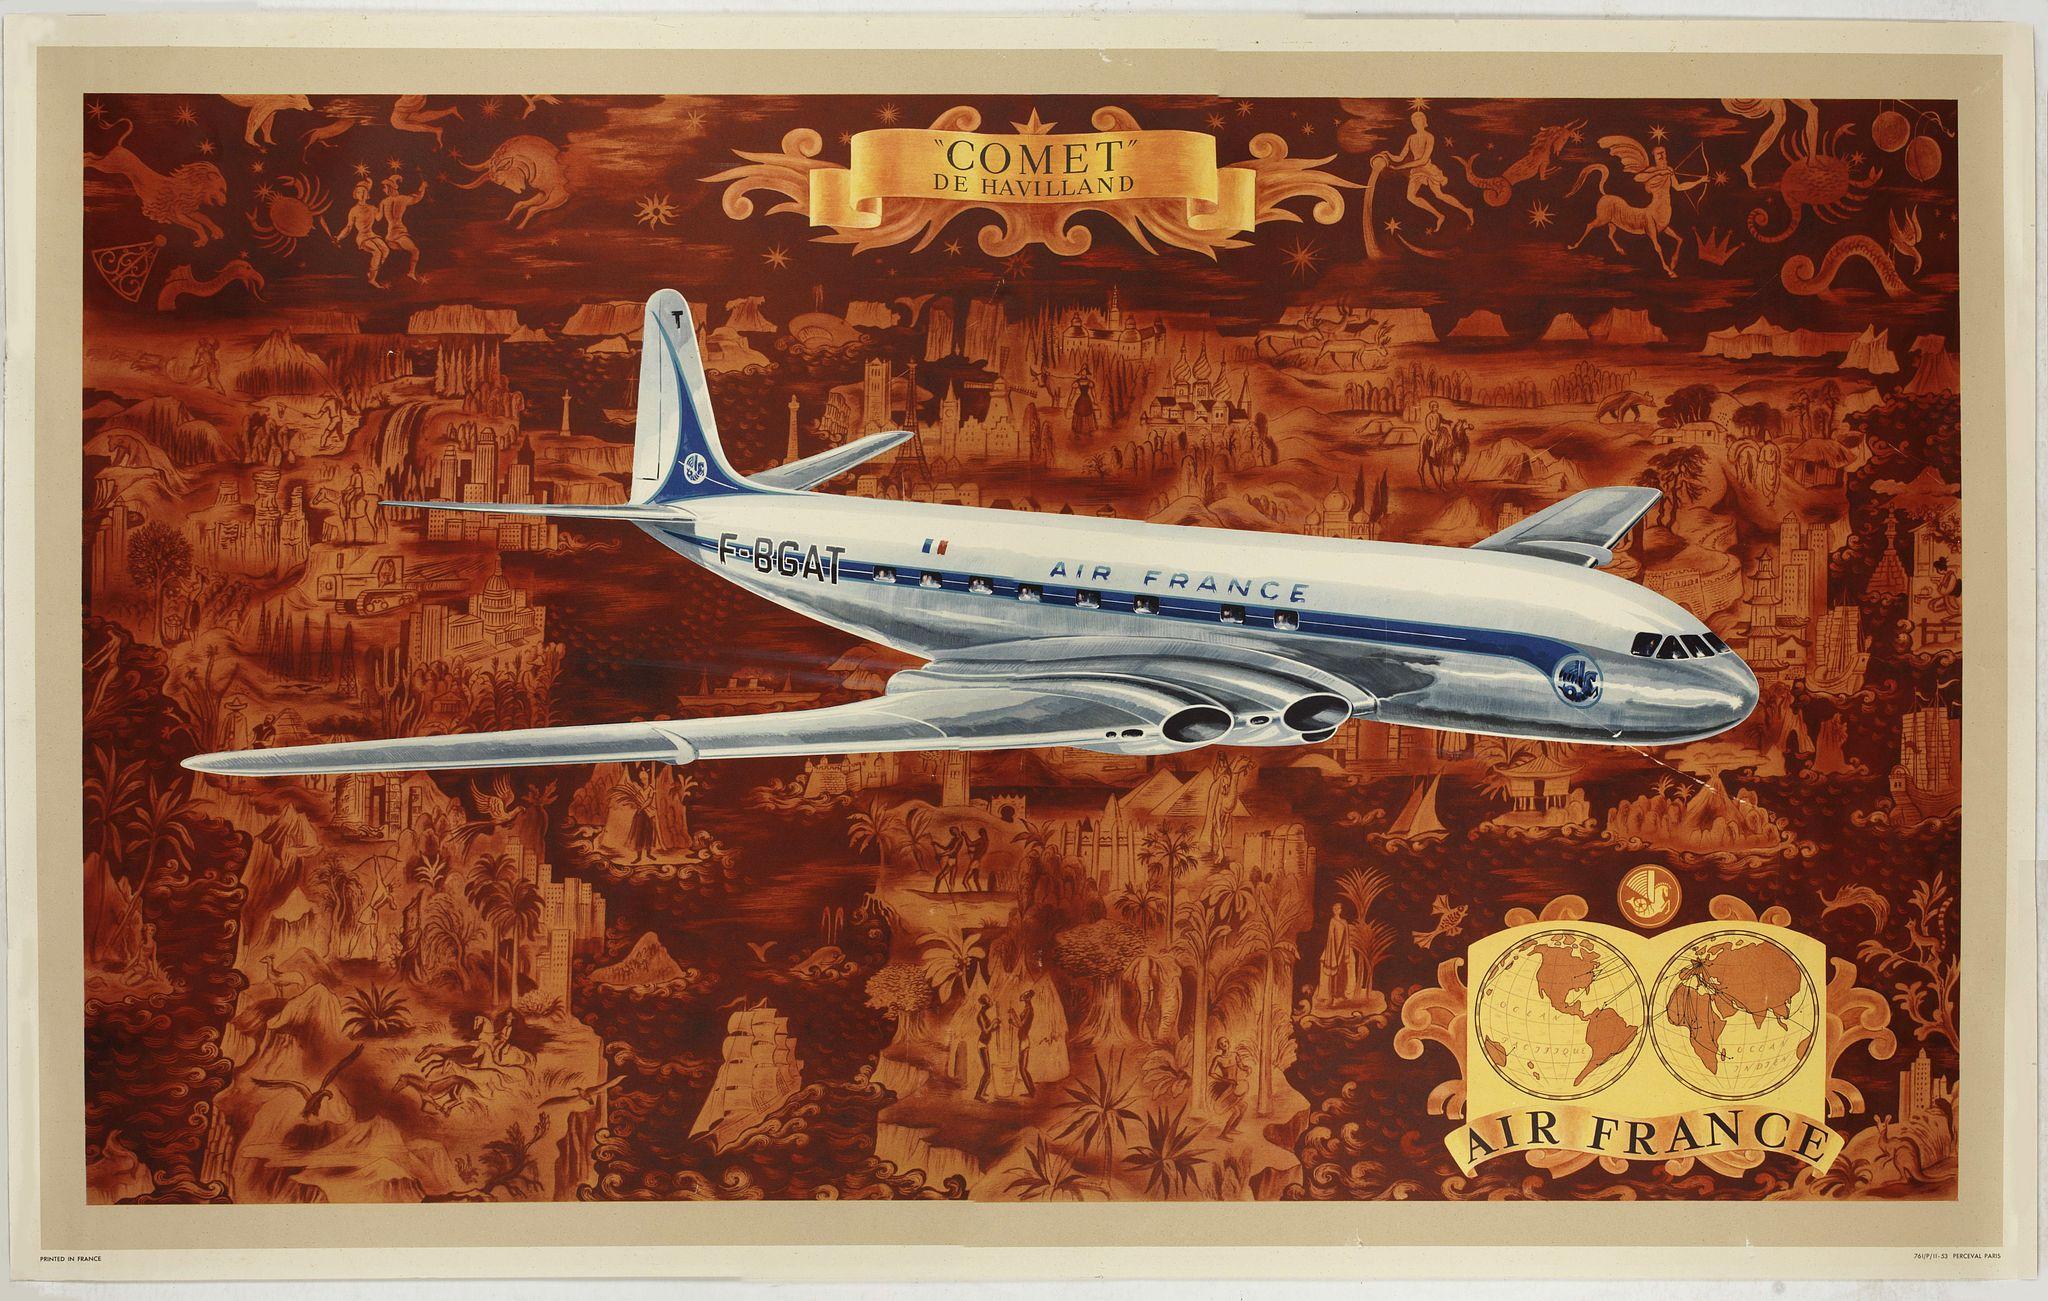 BOUCHER, L. -  AIR France - Comet De Havilland